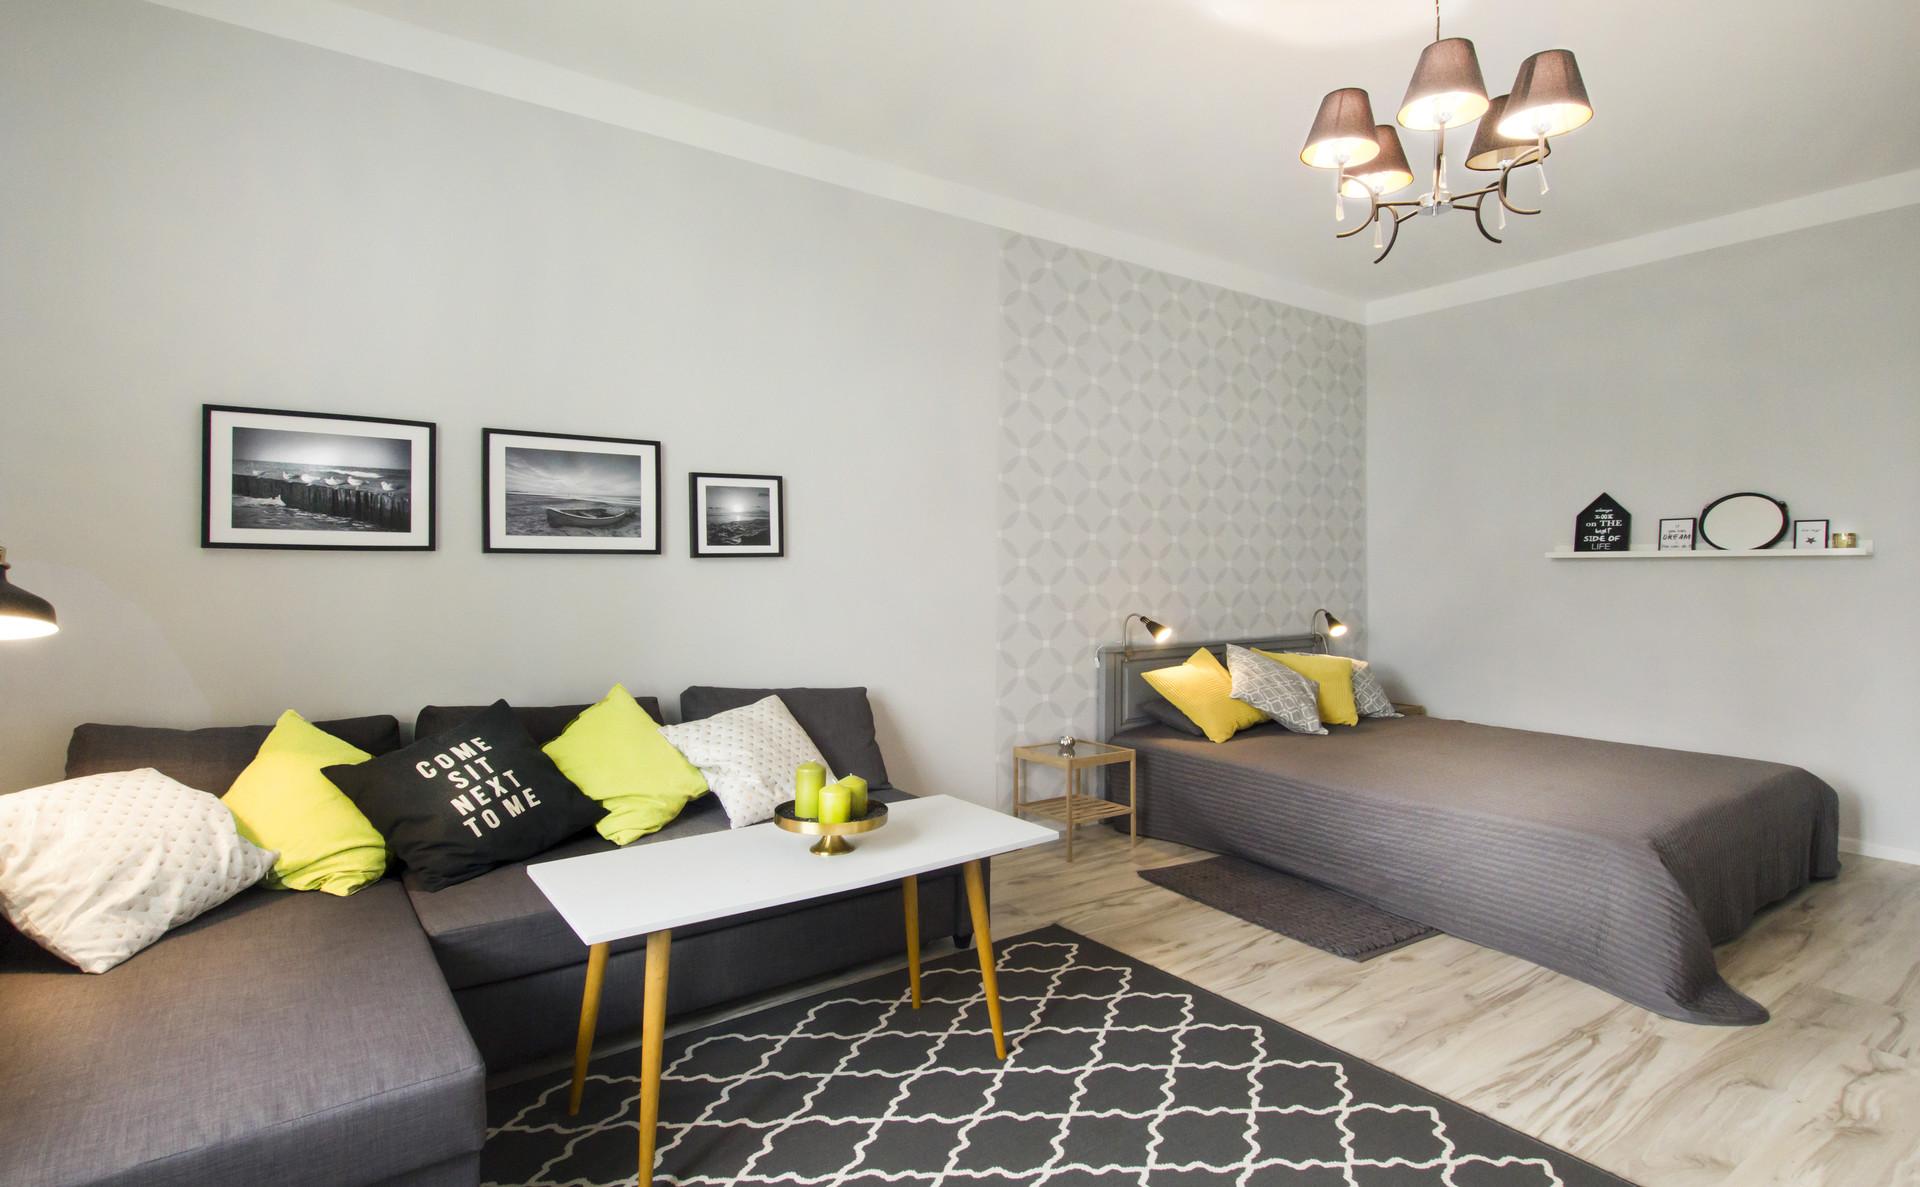 Однокомнатная квартира 40 кв м желтые подушки